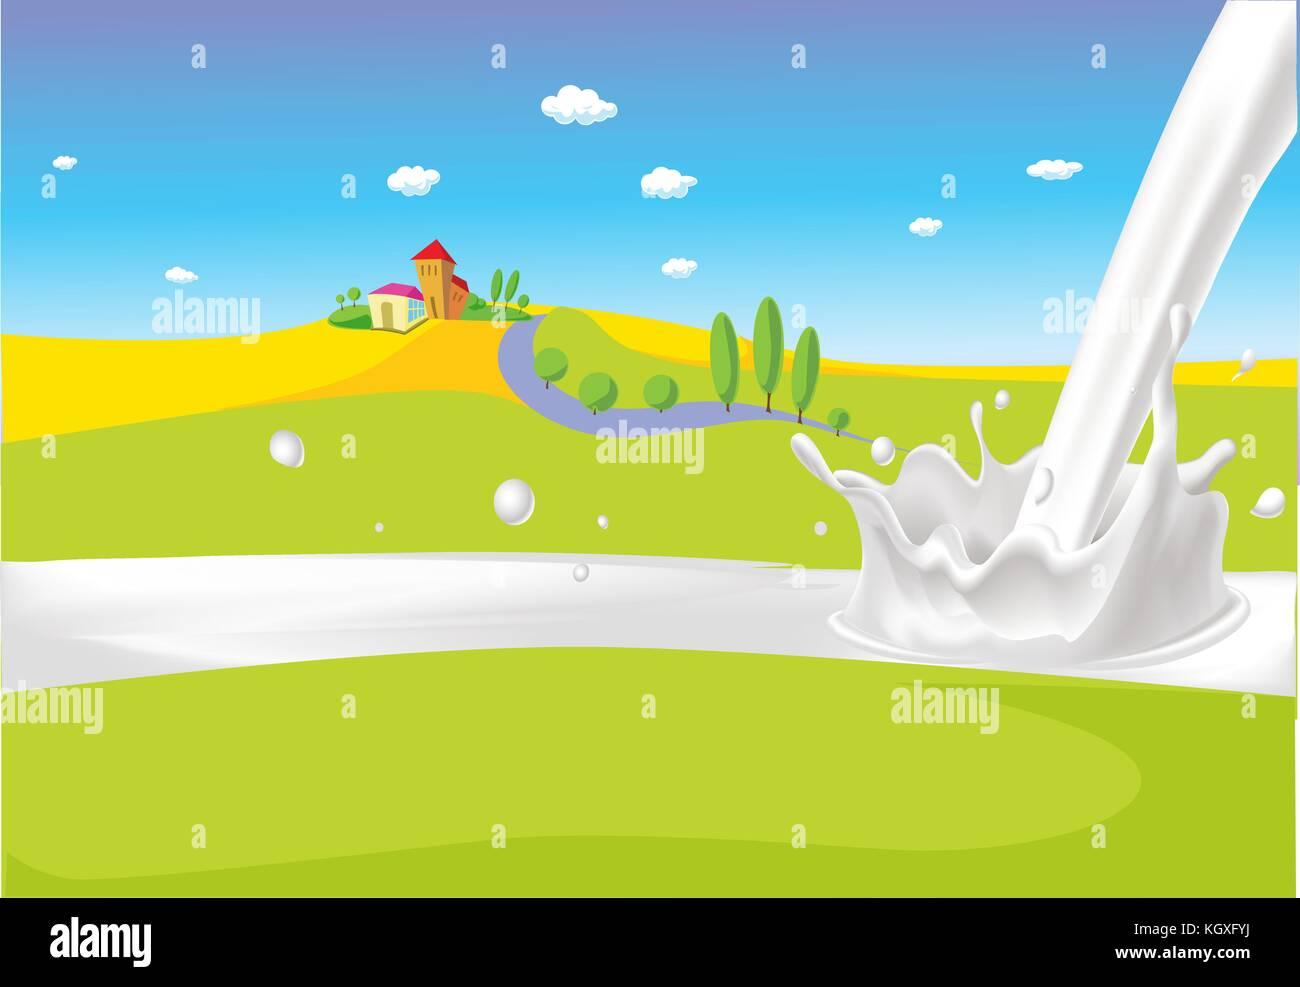 landscape with milk river vector illustration milk splash stock vector image art alamy https www alamy com stock image landscape with milk river vector illustration milk splash 165311094 html